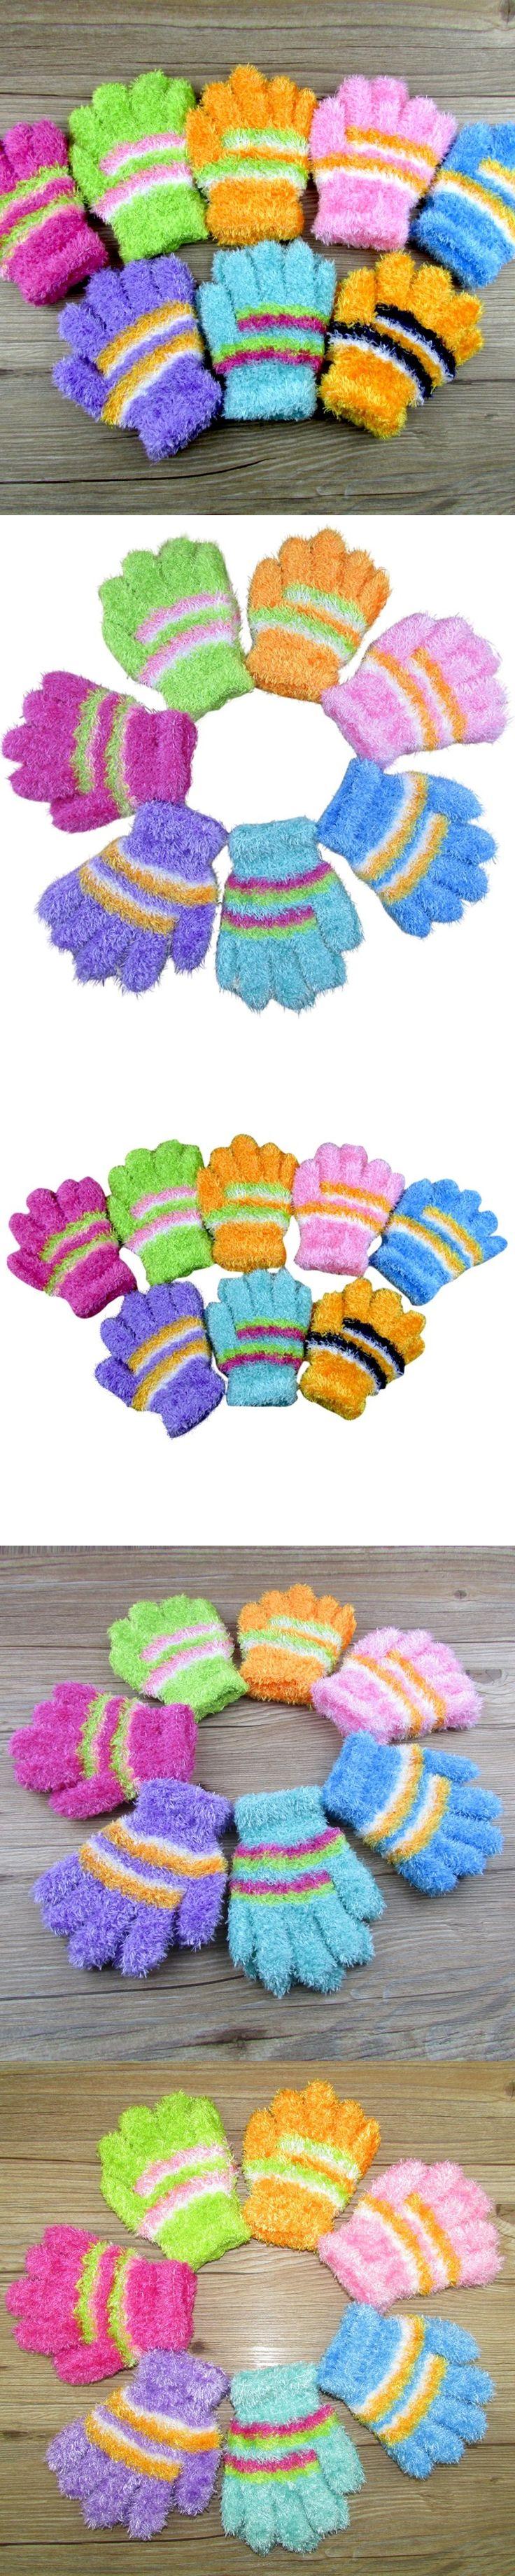 Unisex Kids Warm Winter Gloves Toddler Striped Mittens 2 pc/lot Adult Apparel Accessories